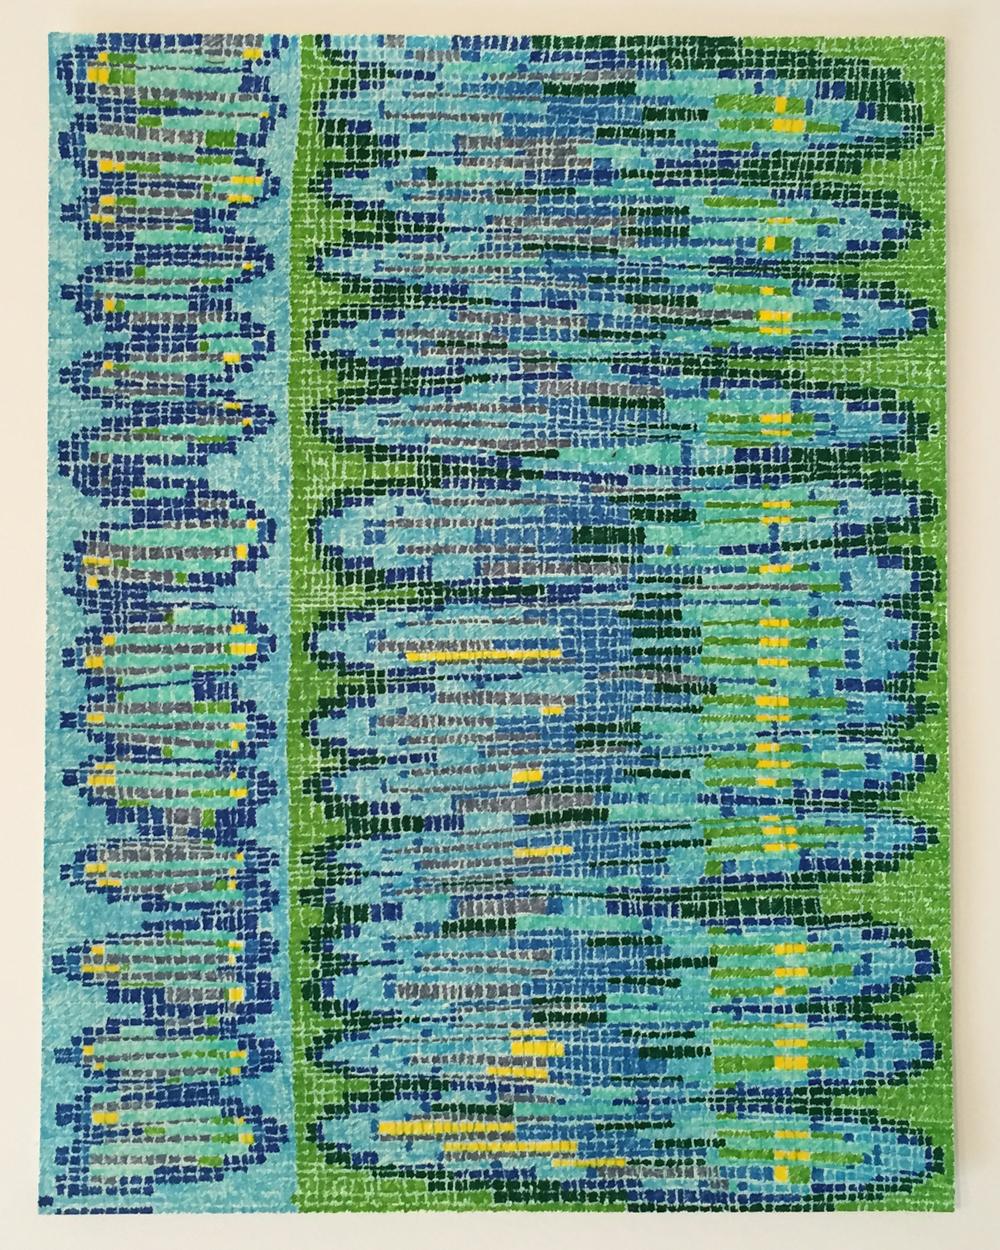 Grid Drawing Bright Blue Green.jpg